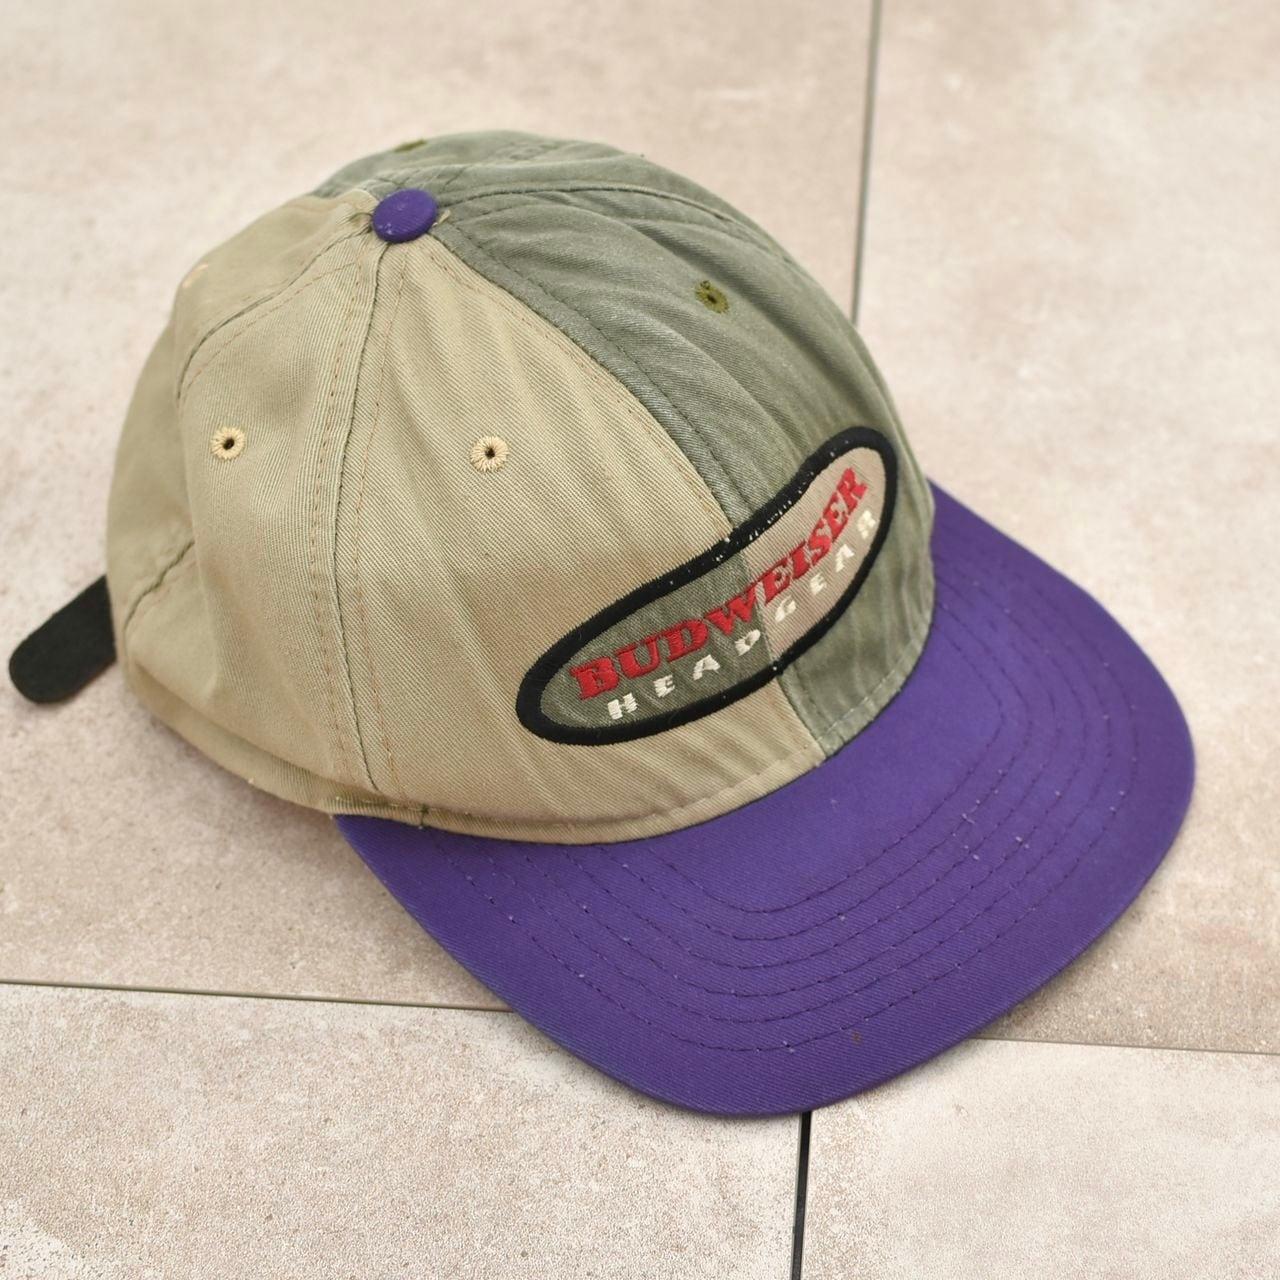 90's American Needle BUDWEISER panel cap